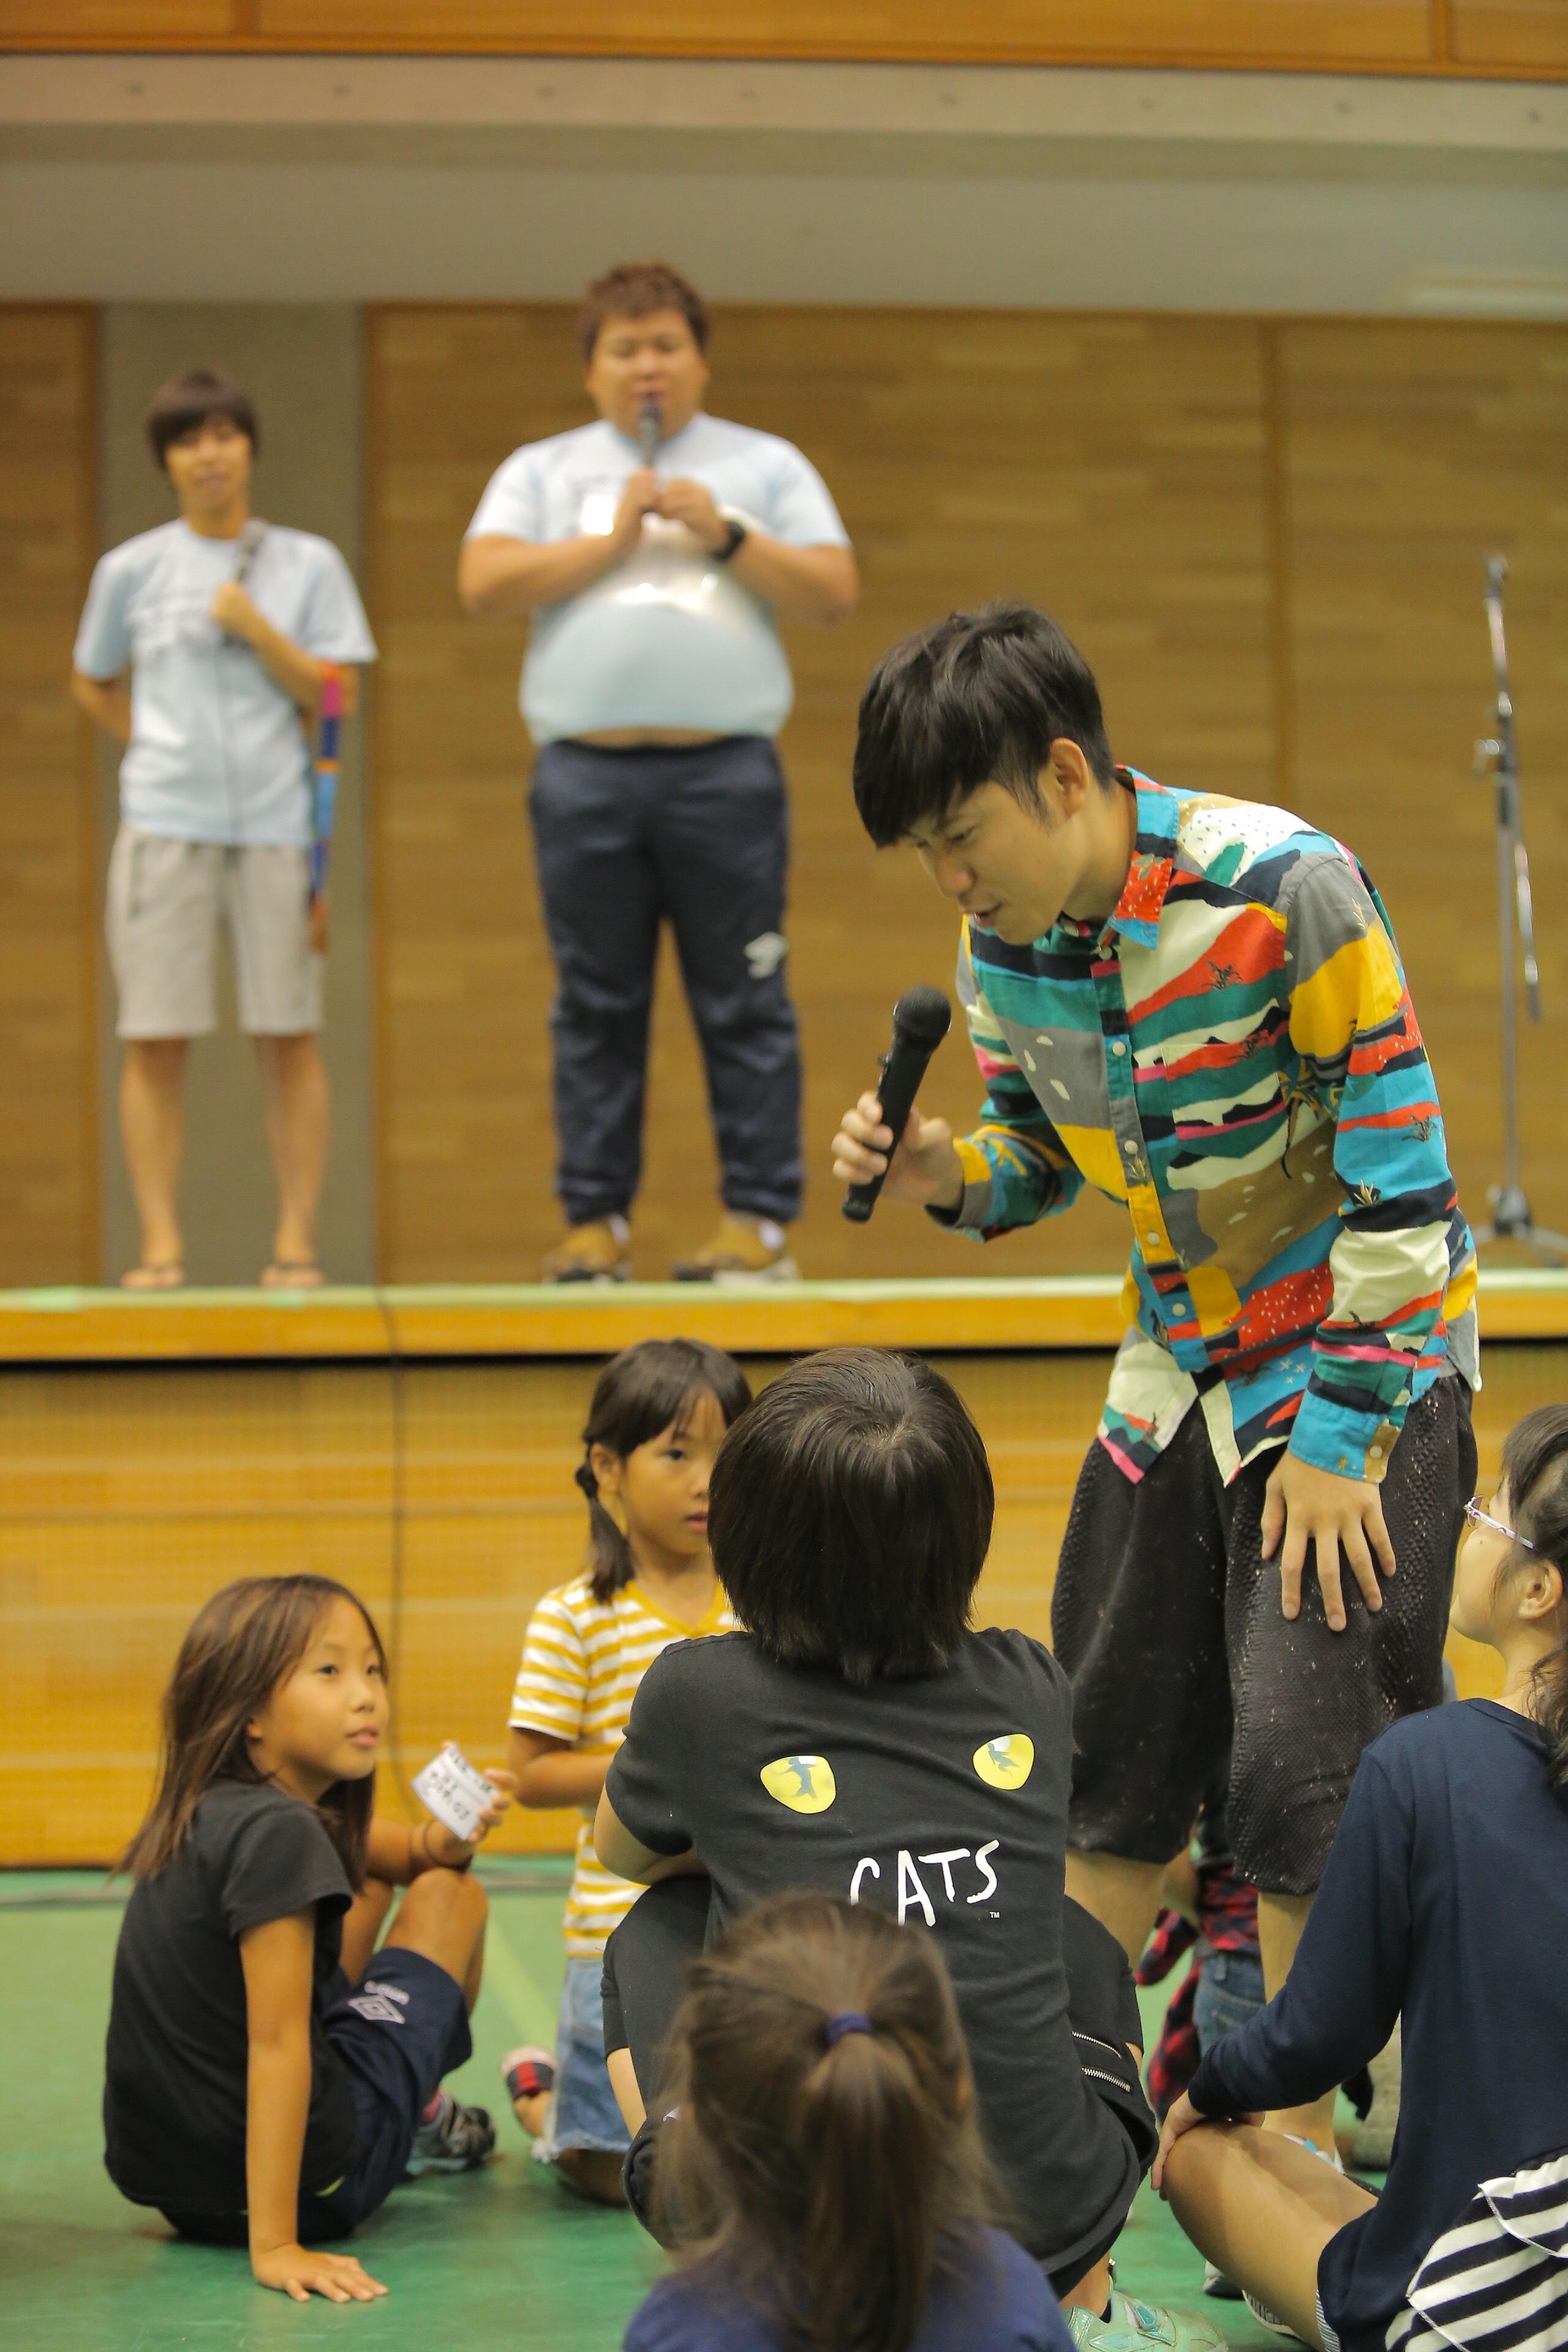 http://news.yoshimoto.co.jp/20171001212054-000642033e4337415eba00e03fe05378a5be9c10.jpg